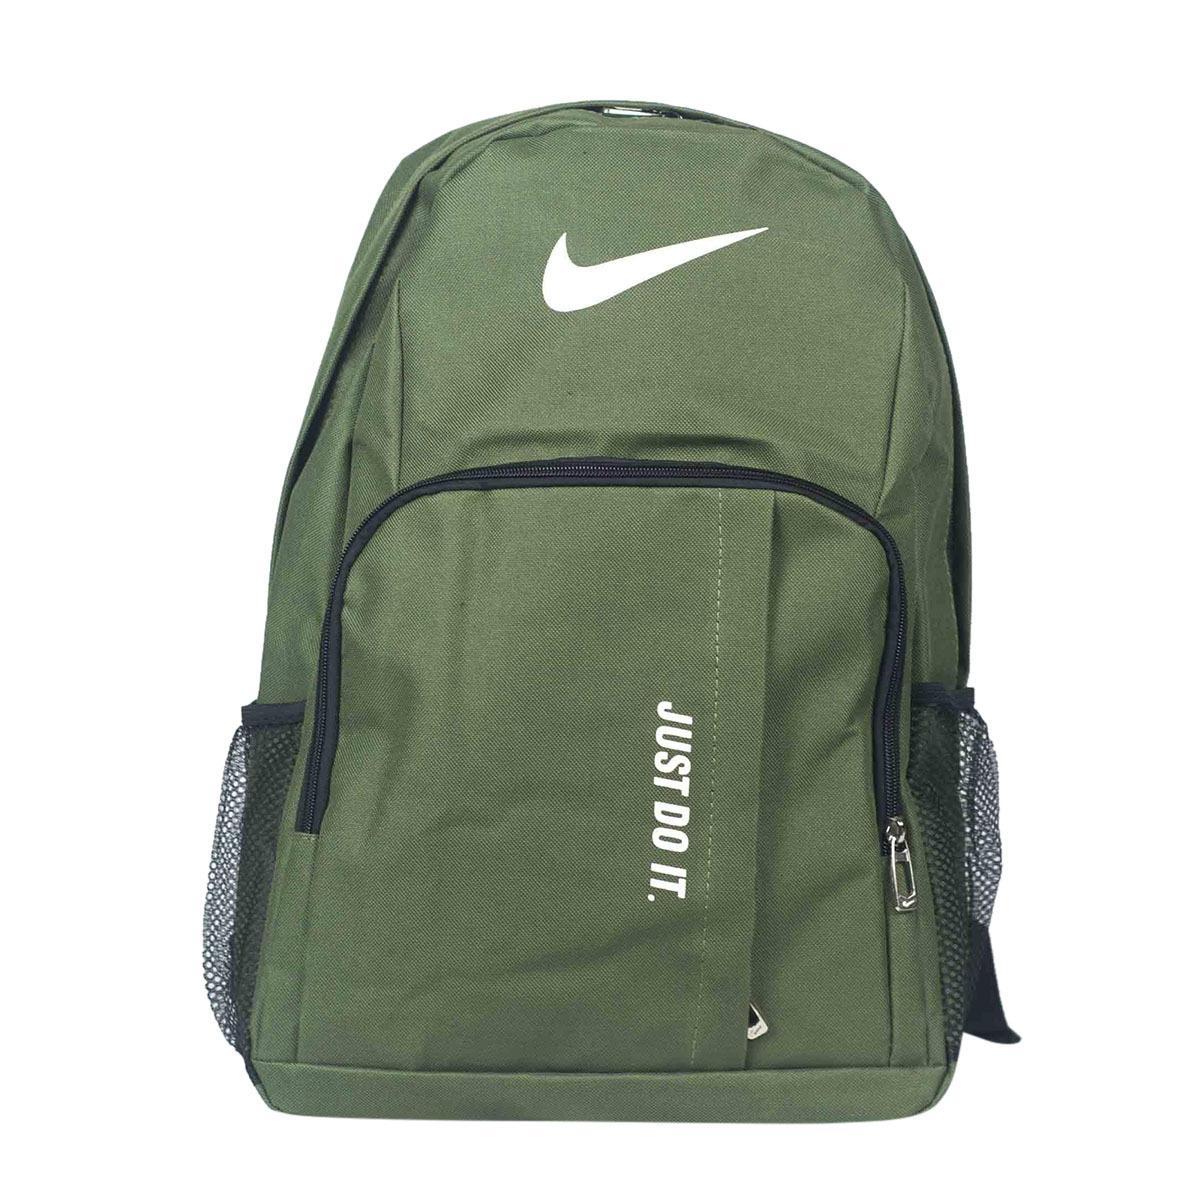 fa52a7031 Men's Bags Online - Buy Bags For Men In Bangladesh - Daraz.com.bd